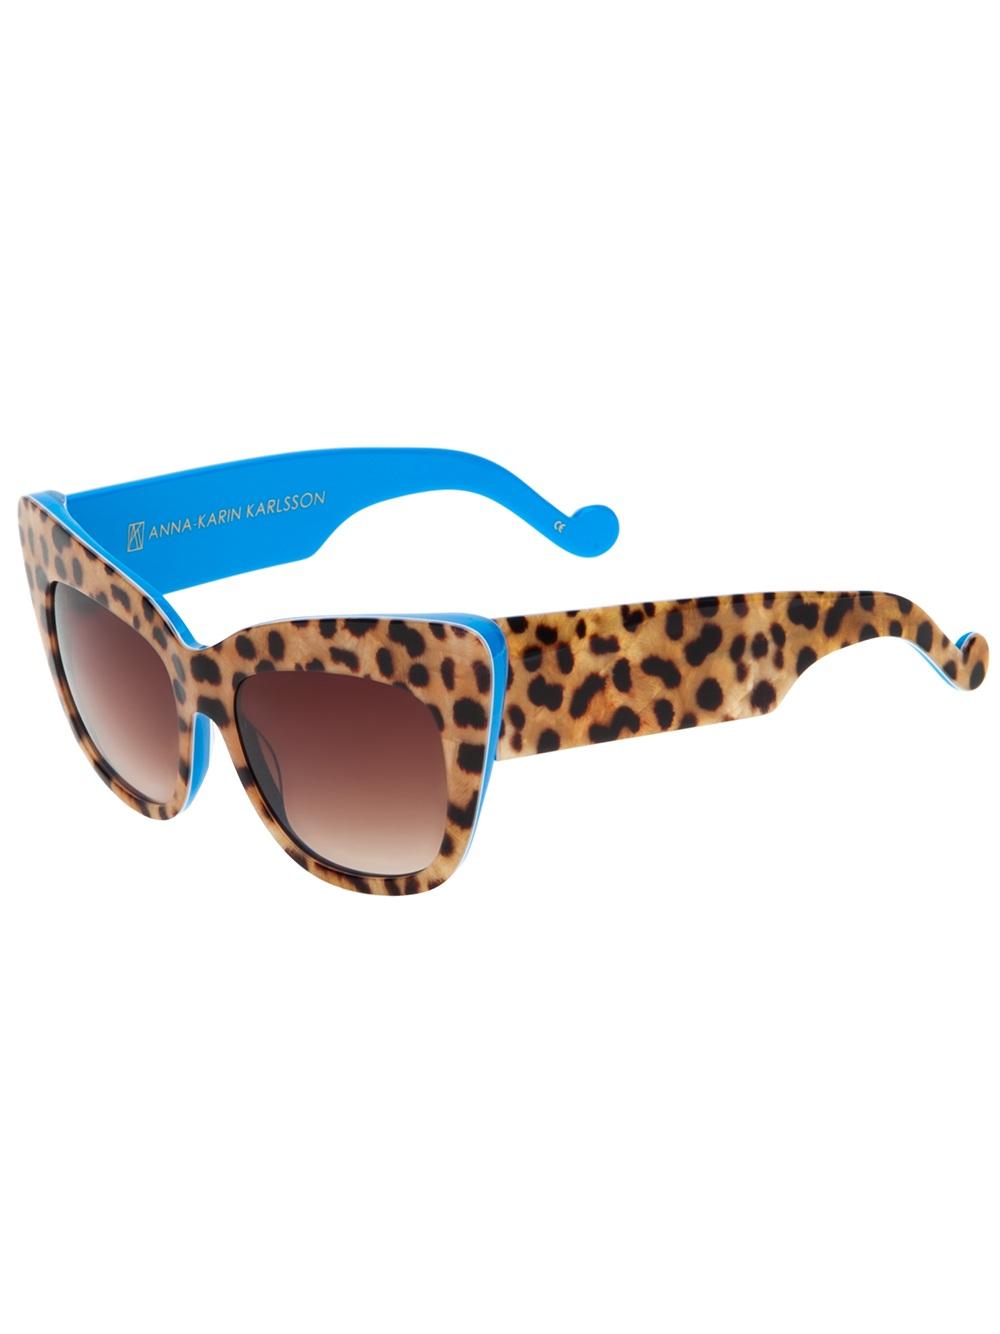 Alice Goes to Cannes sunglasses - Multicolour Anna-Karin Karlsson o7GE6eWl